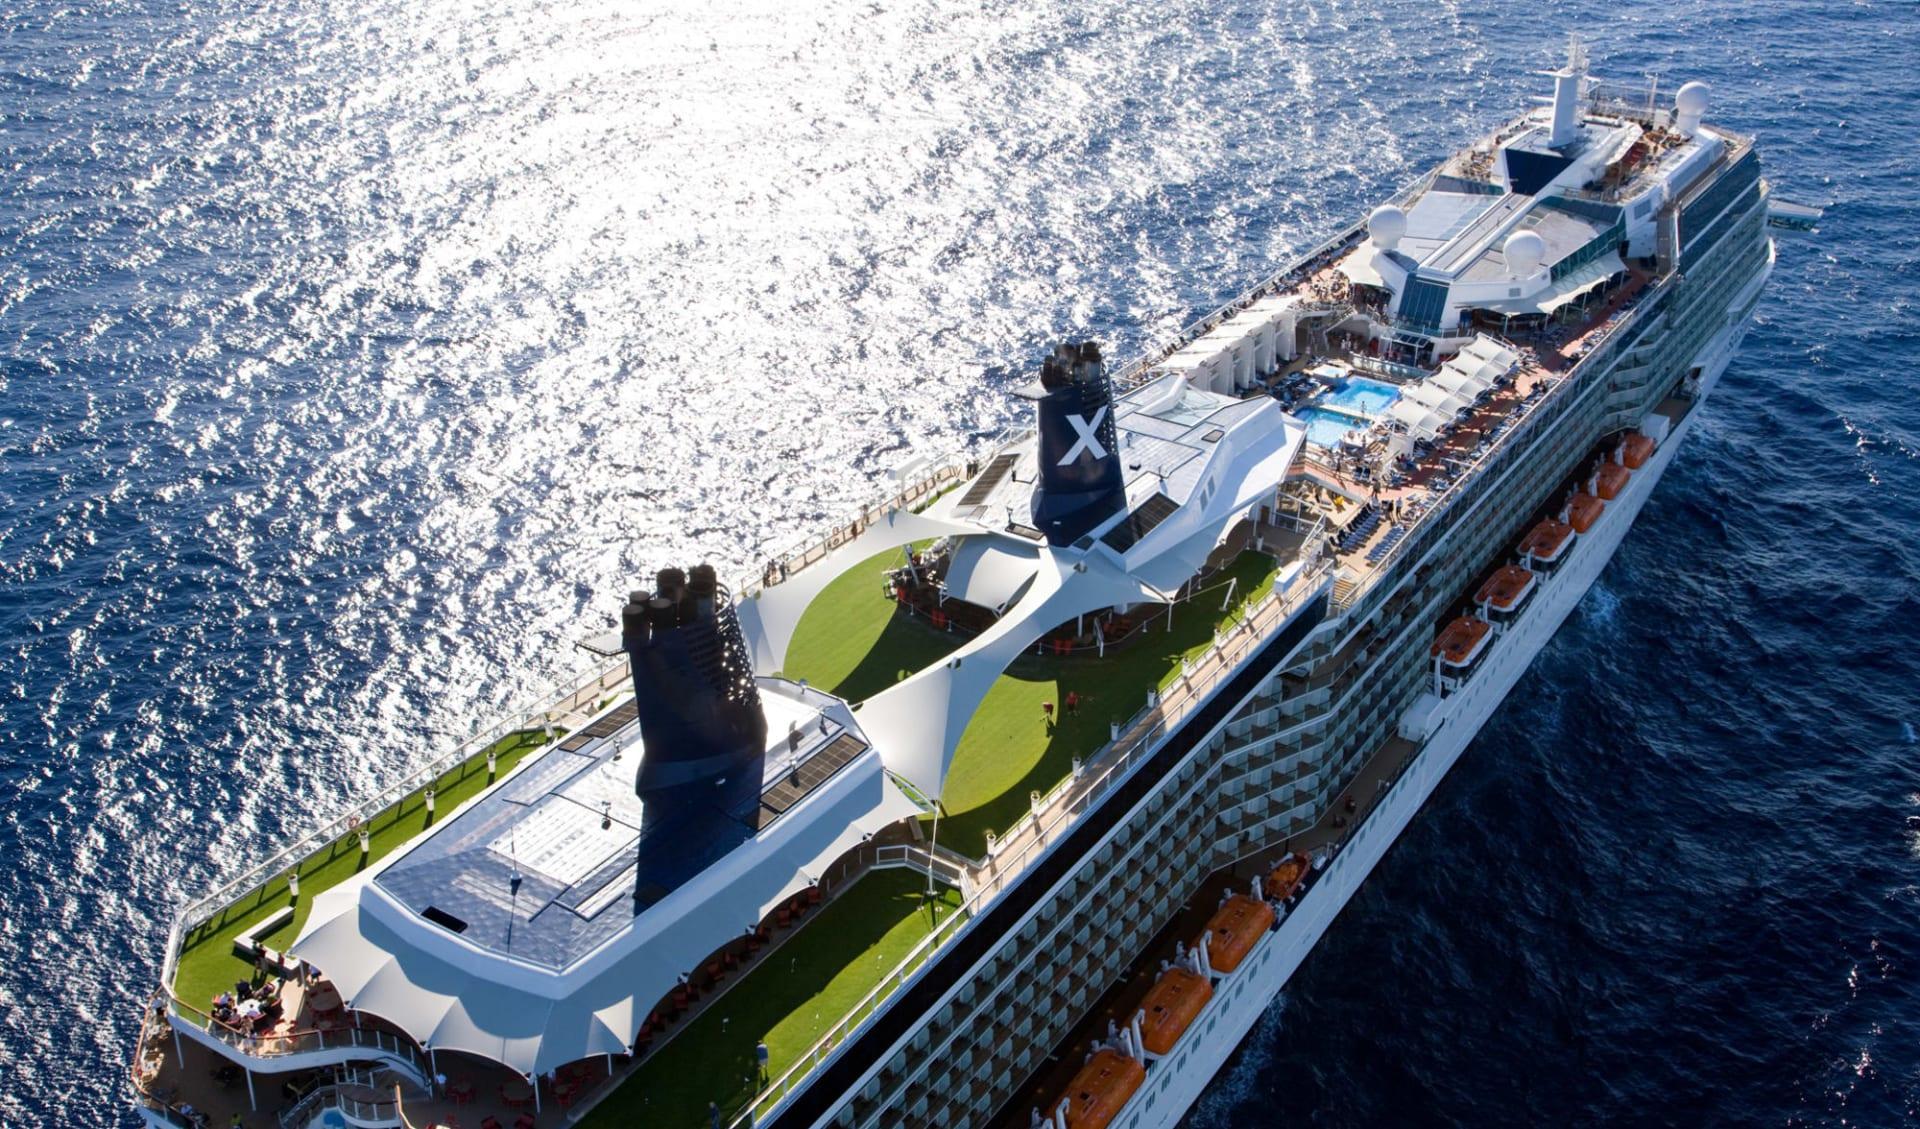 Kreuzfahrt Neuseeland, Fidschi, Samoa und Tonga ab Auckland: exterior: Celebrity Cruises - Celebrity Solstice